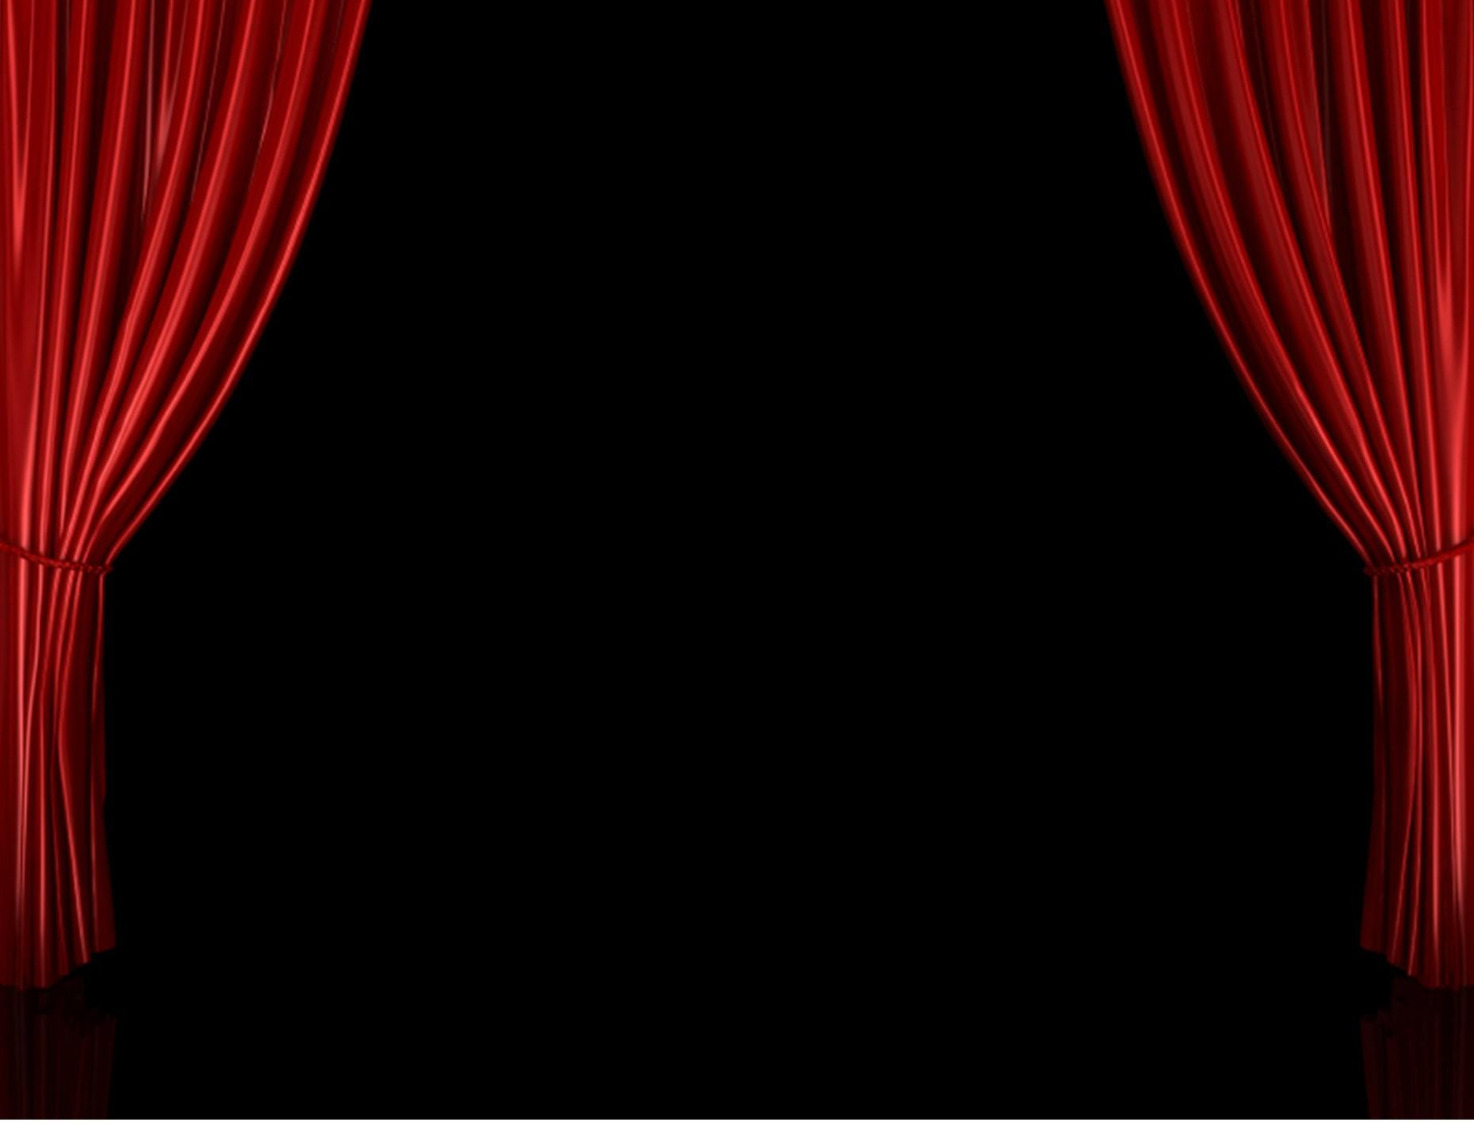 red curtain Theatre-curtain-e1363045860284